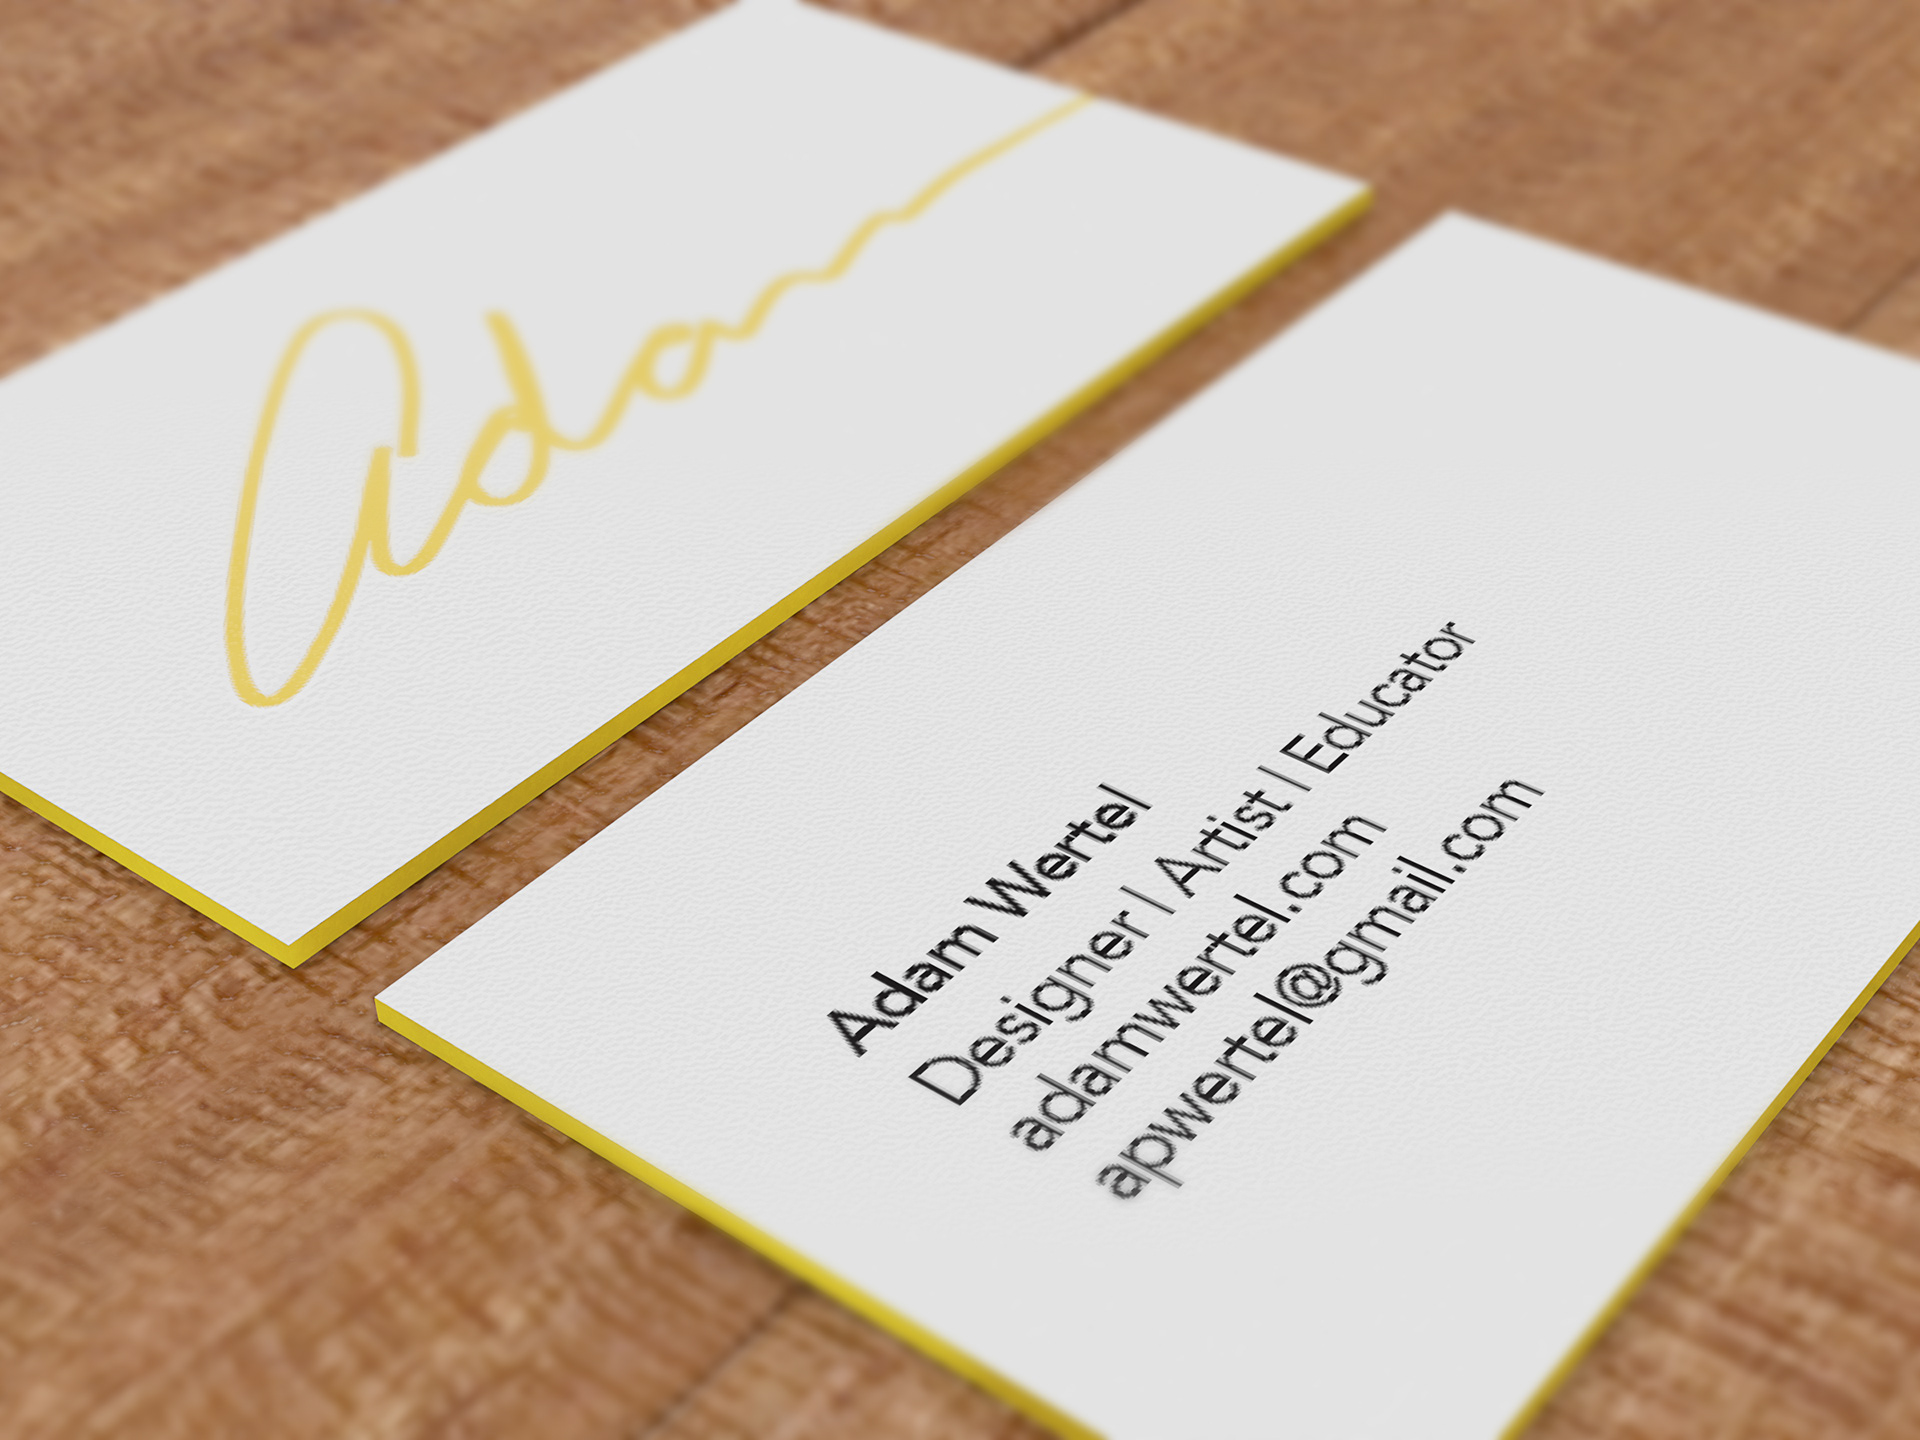 Adam wertel personal branding business card personal branding business card colourmoves